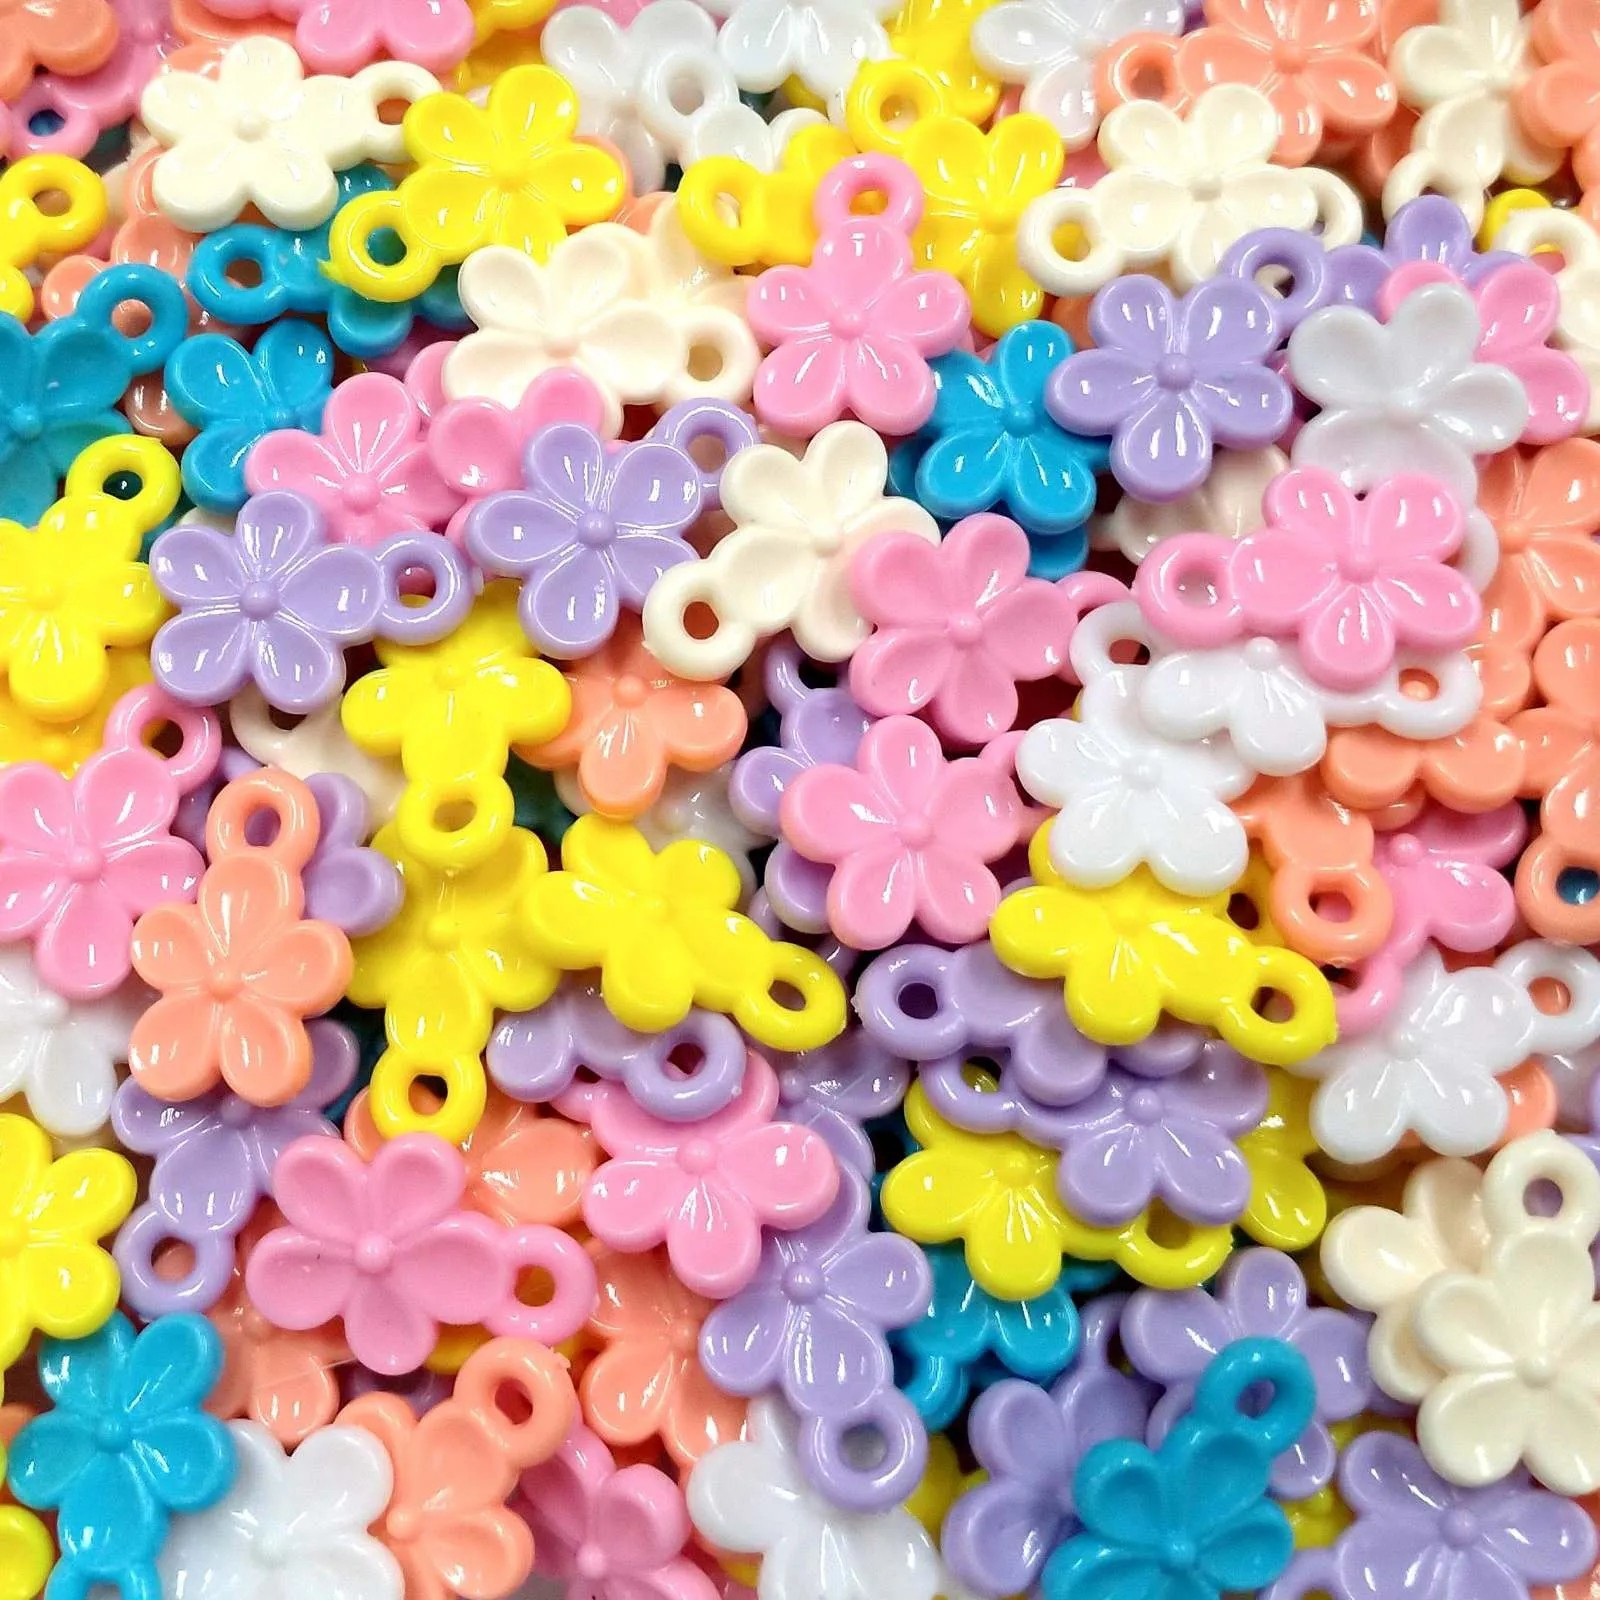 Pingente Plástico Flores Coloridas 14x19mm - Pacote 65 unidades